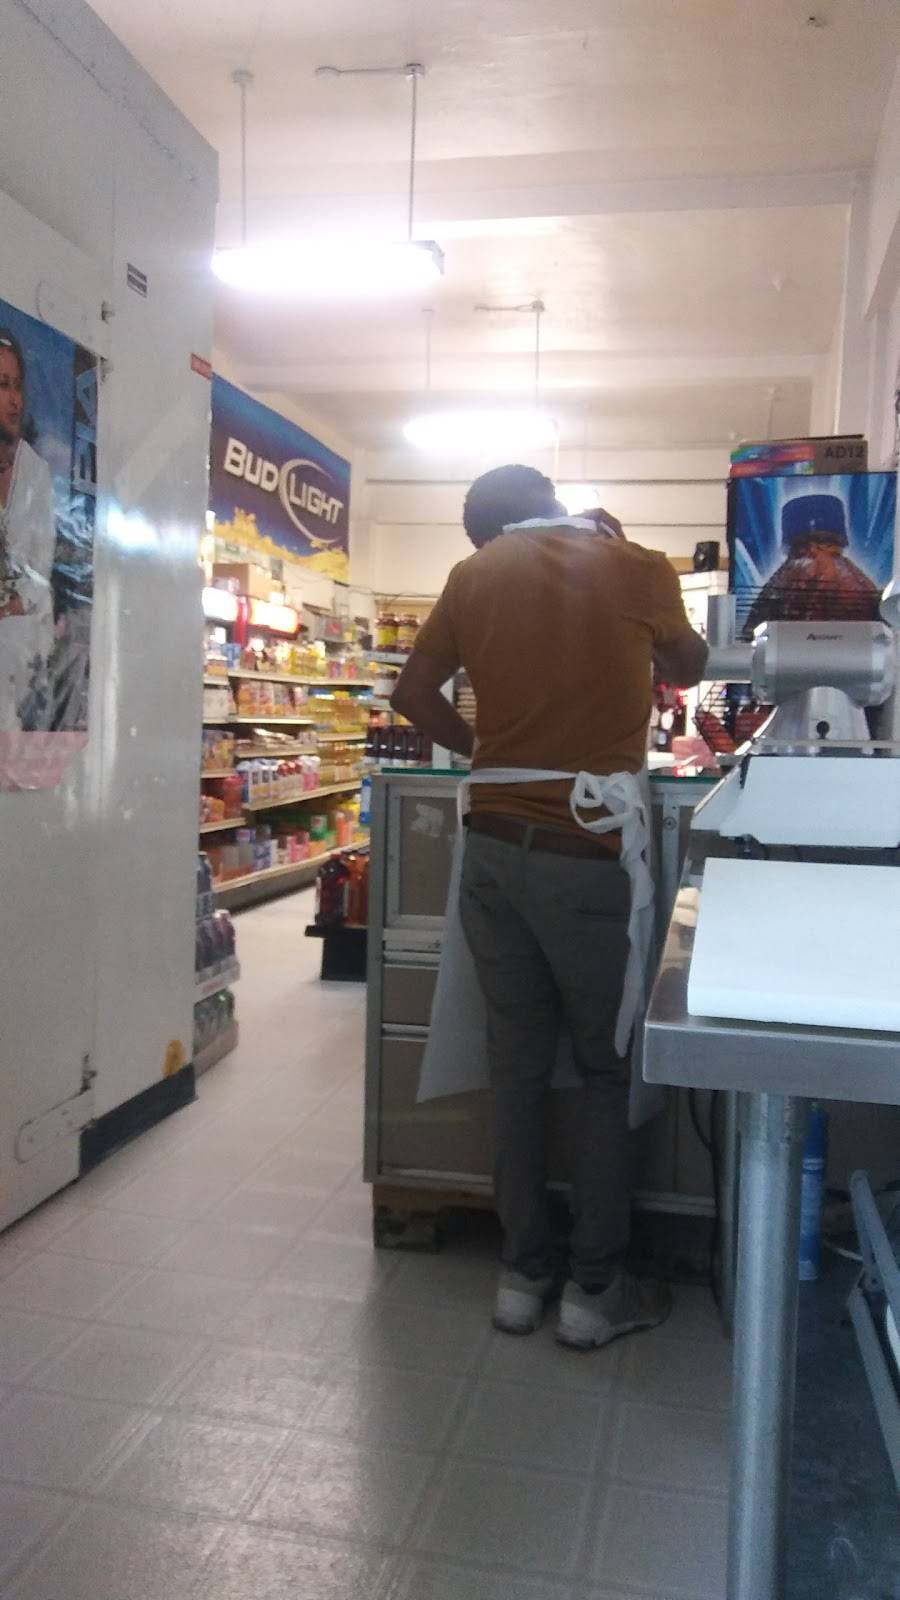 Meskel Market - convenience store  | Photo 2 of 2 | Address: 839 N Killingsworth St, Portland, OR 97217, USA | Phone: (503) 283-8732